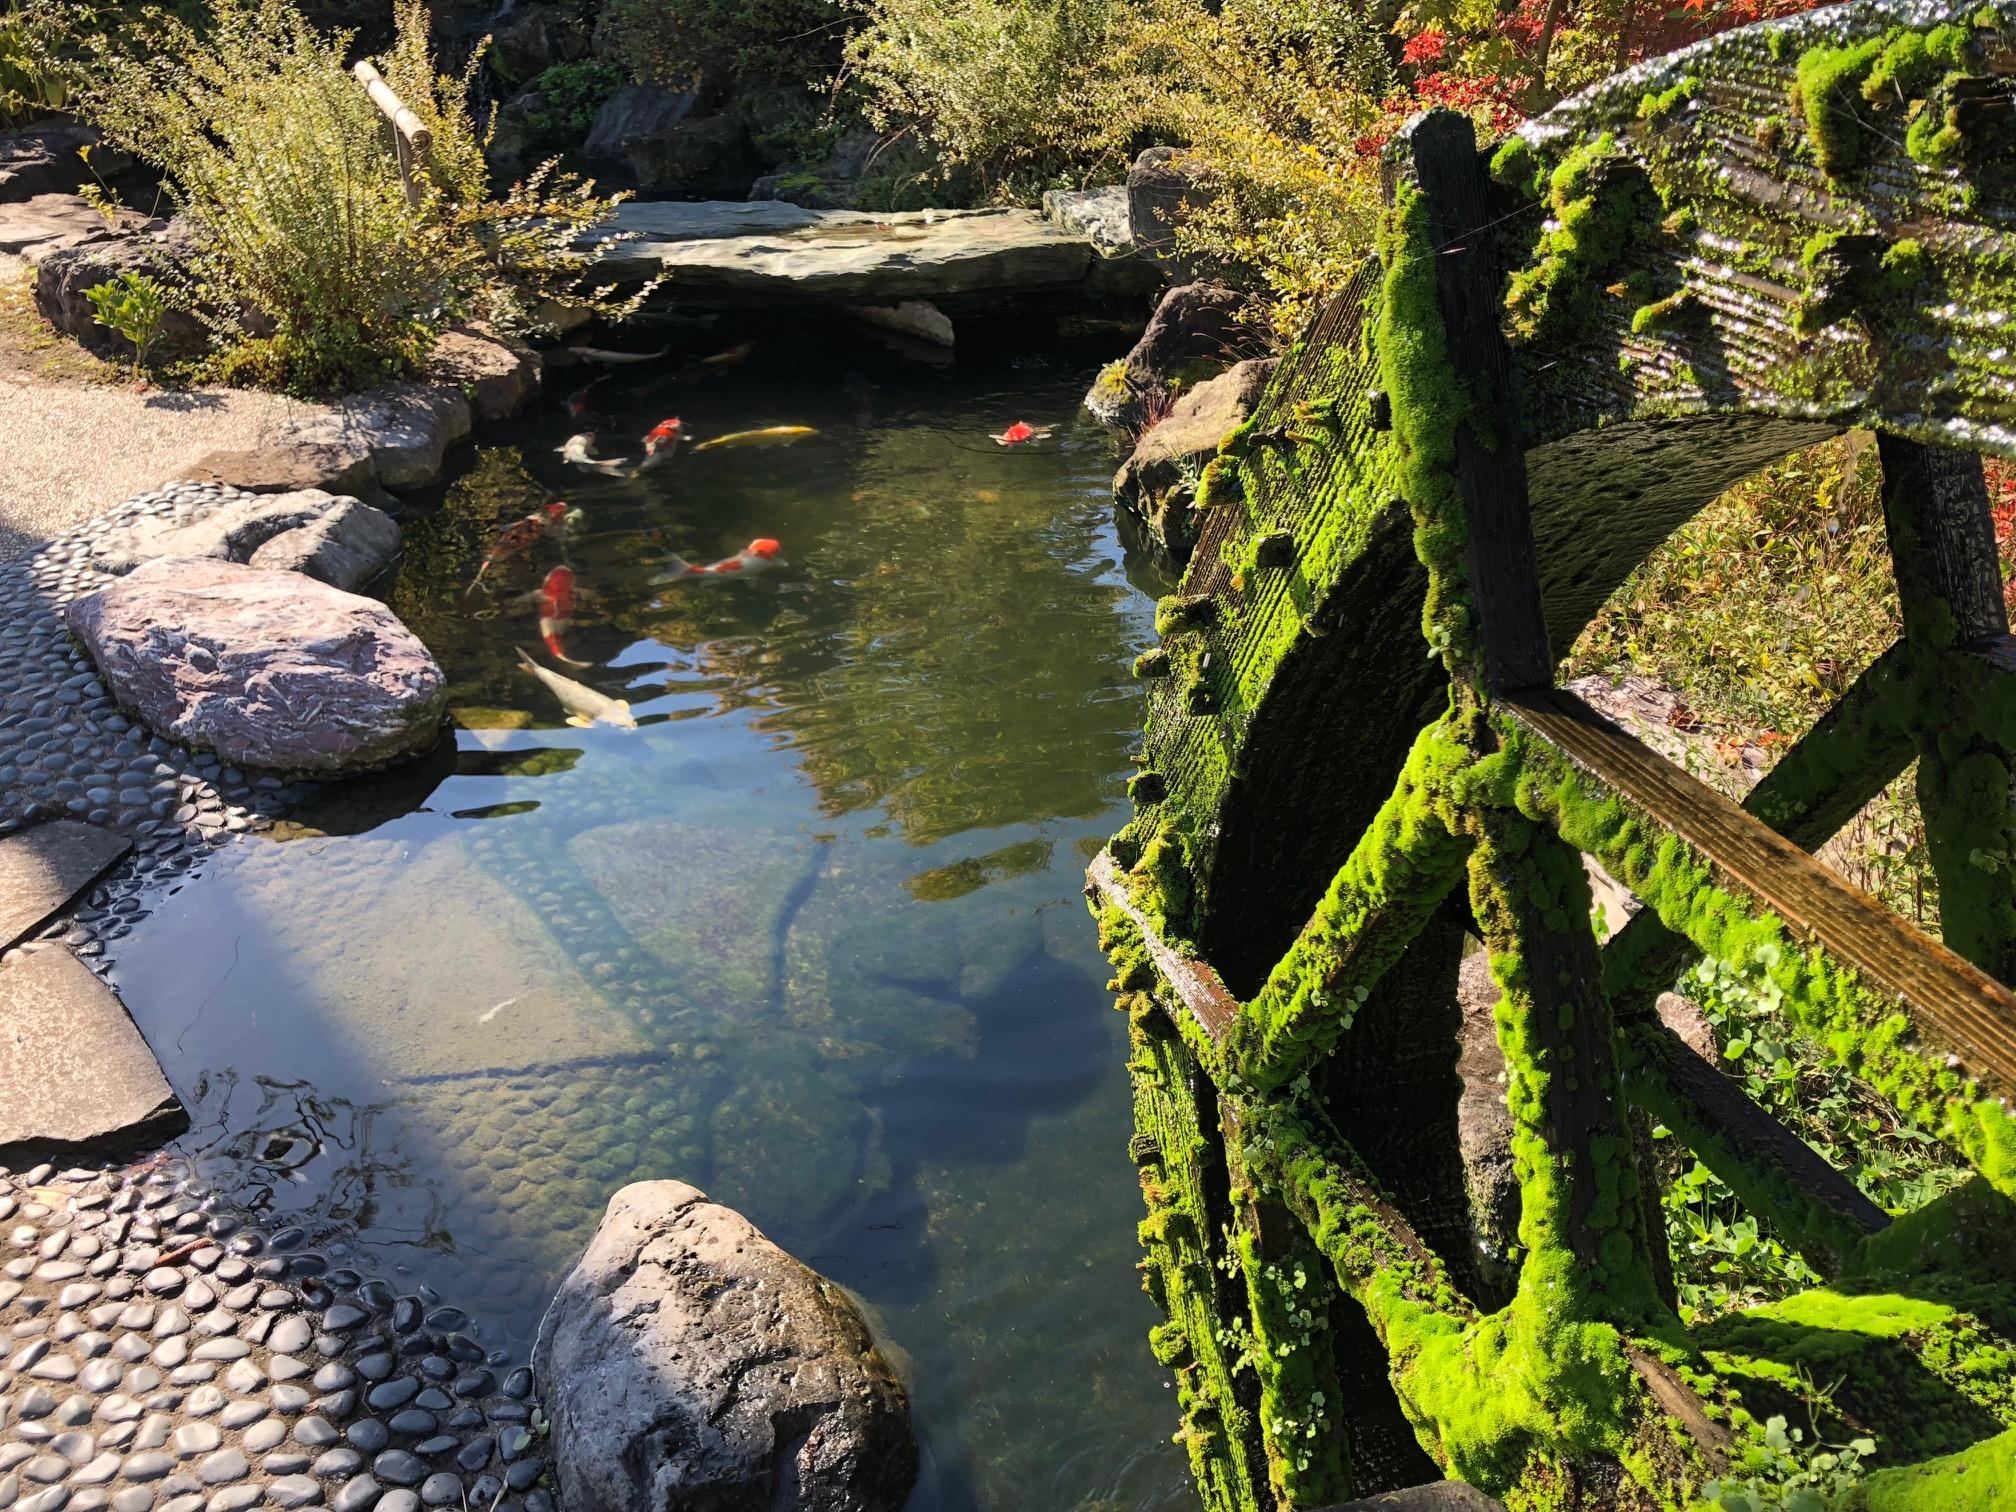 月岡温泉の池